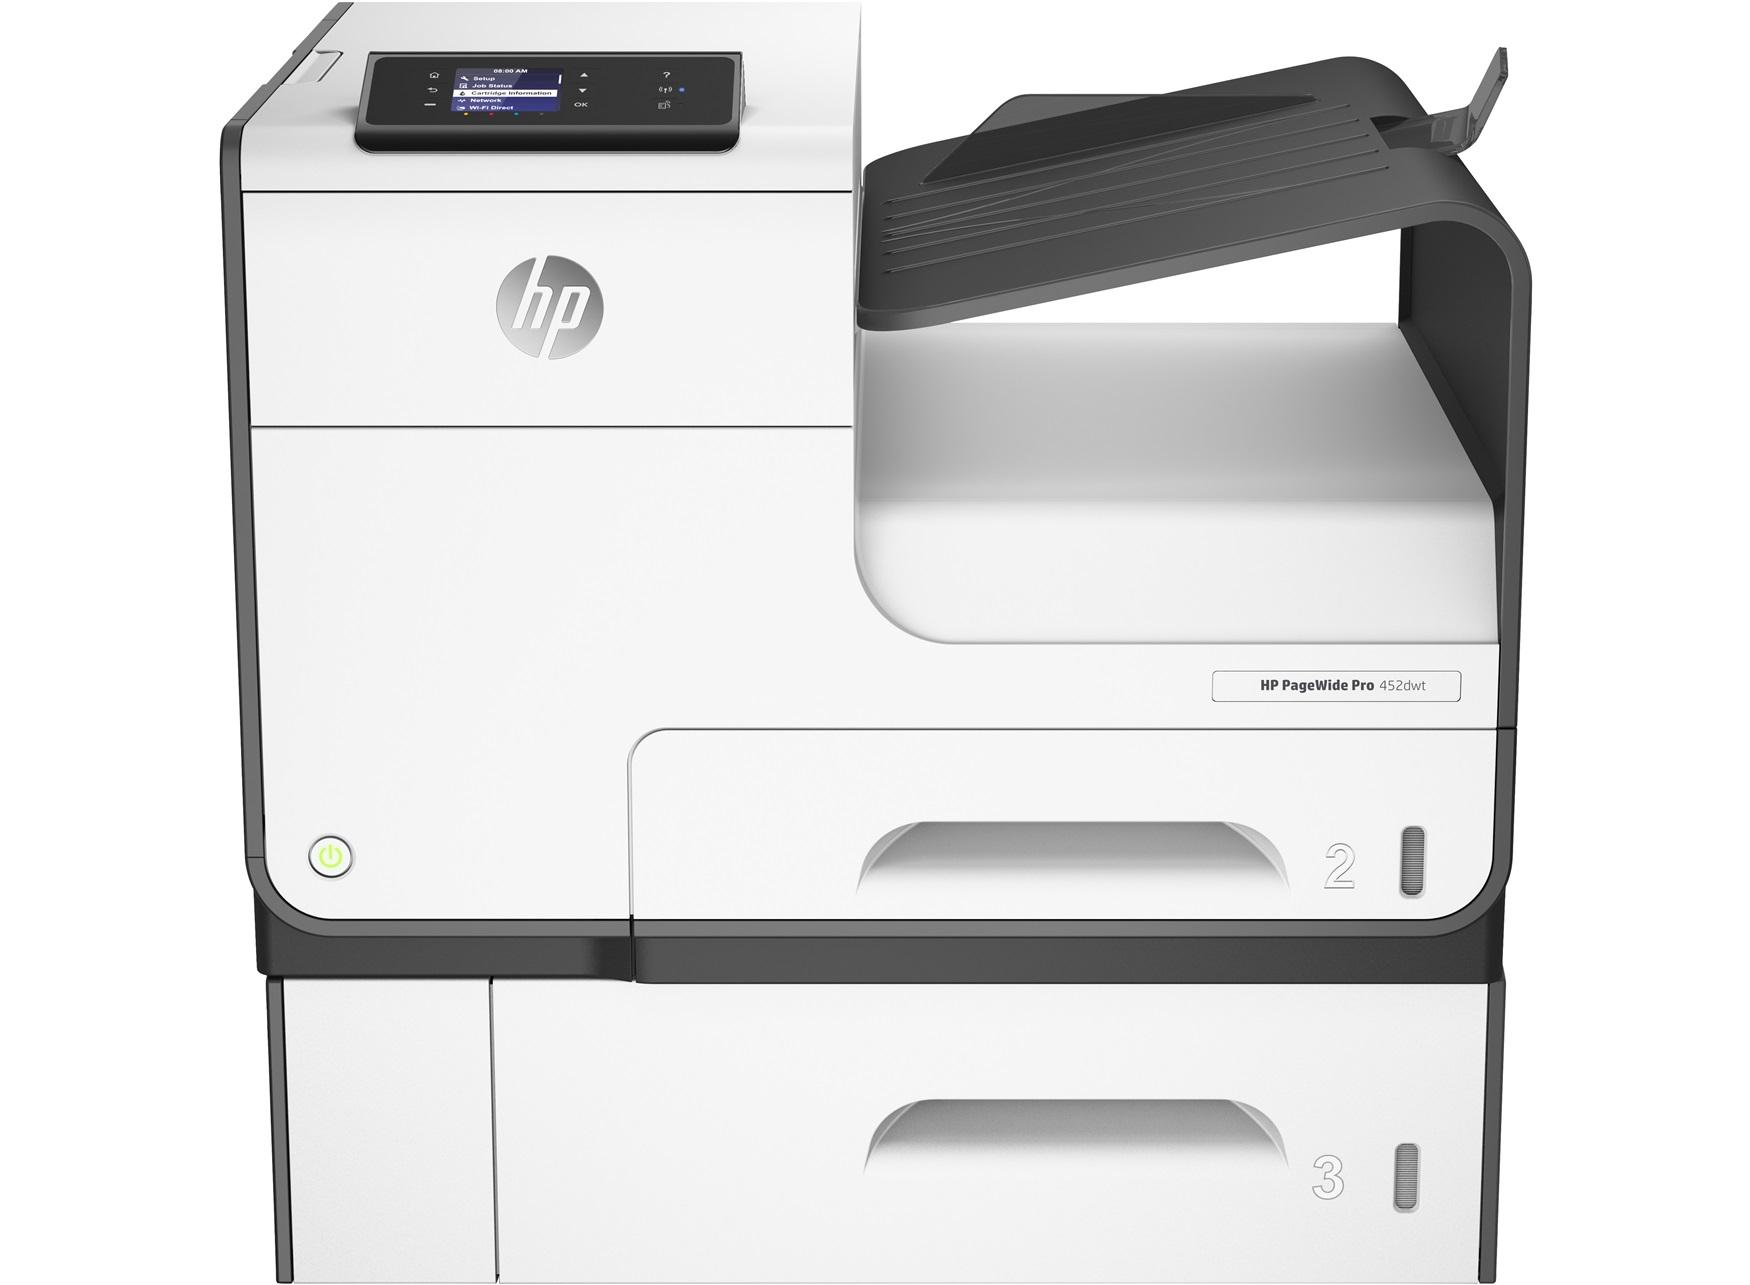 HP PageWide Pro 452dwt Printer & Tray Farbe 2400 x 1200DPI A4 WLAN Tintenstrahldrucker